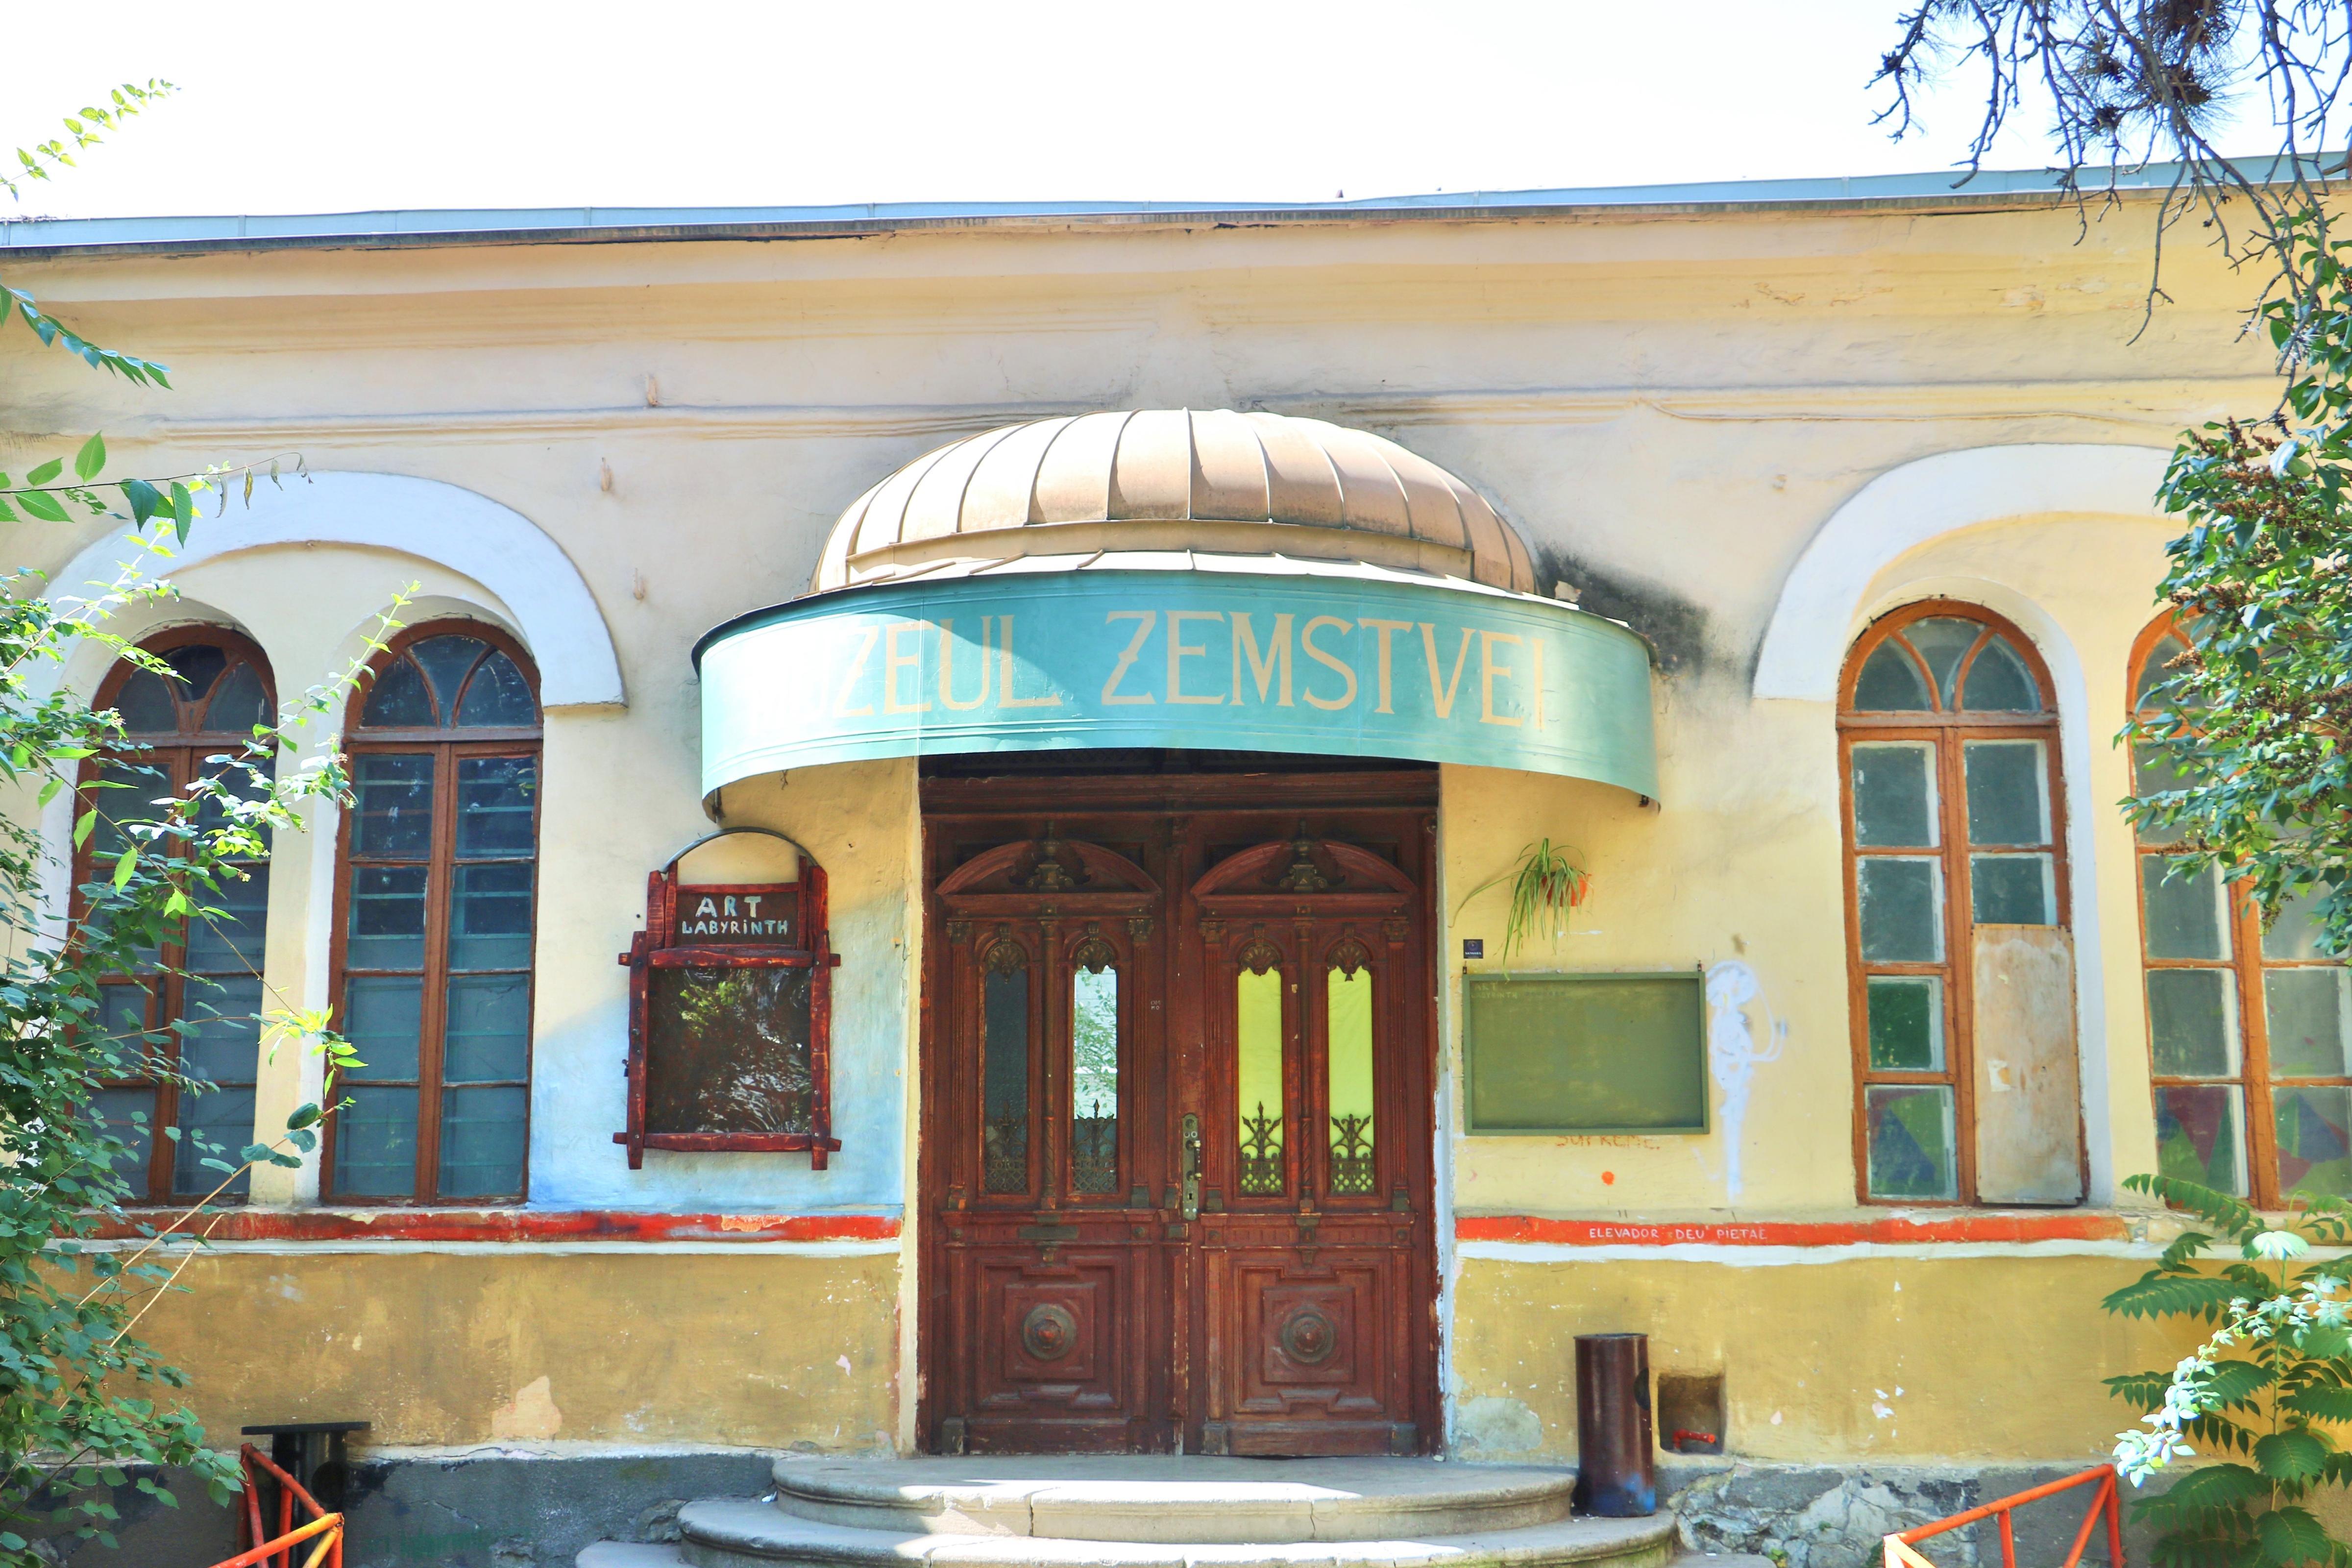 Zemstvei Museum